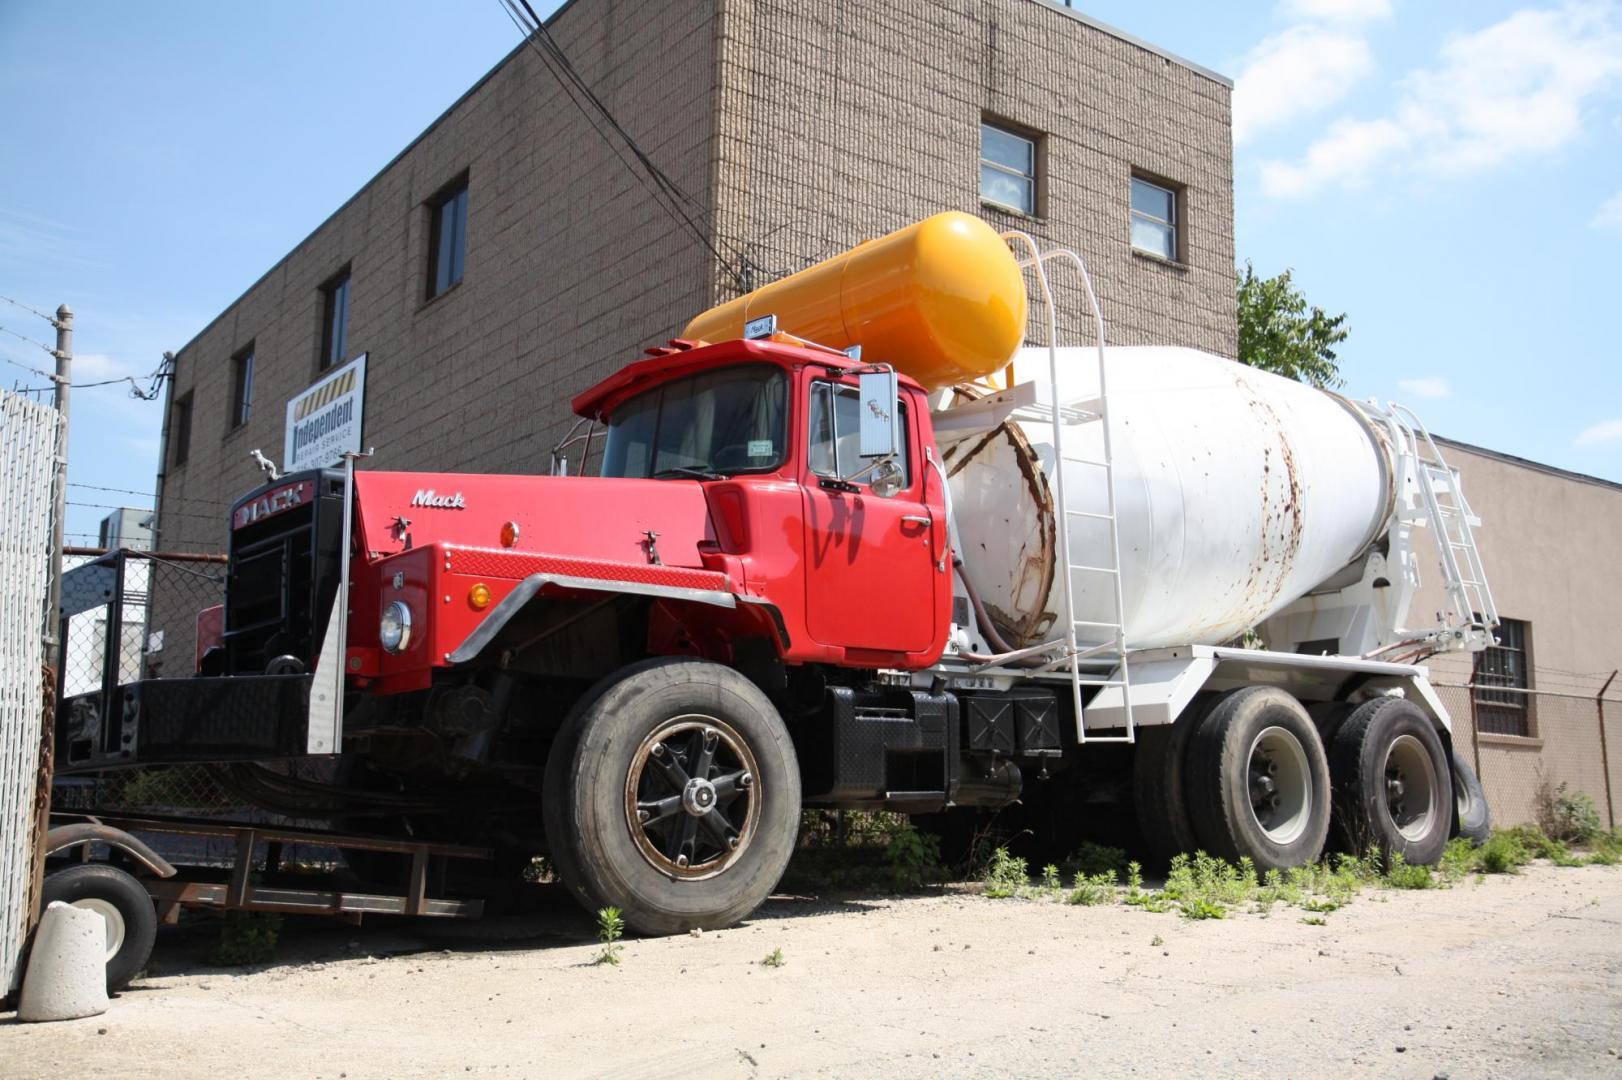 Mack Dm800 Concrete Truck Under Glass Big Rigs Model